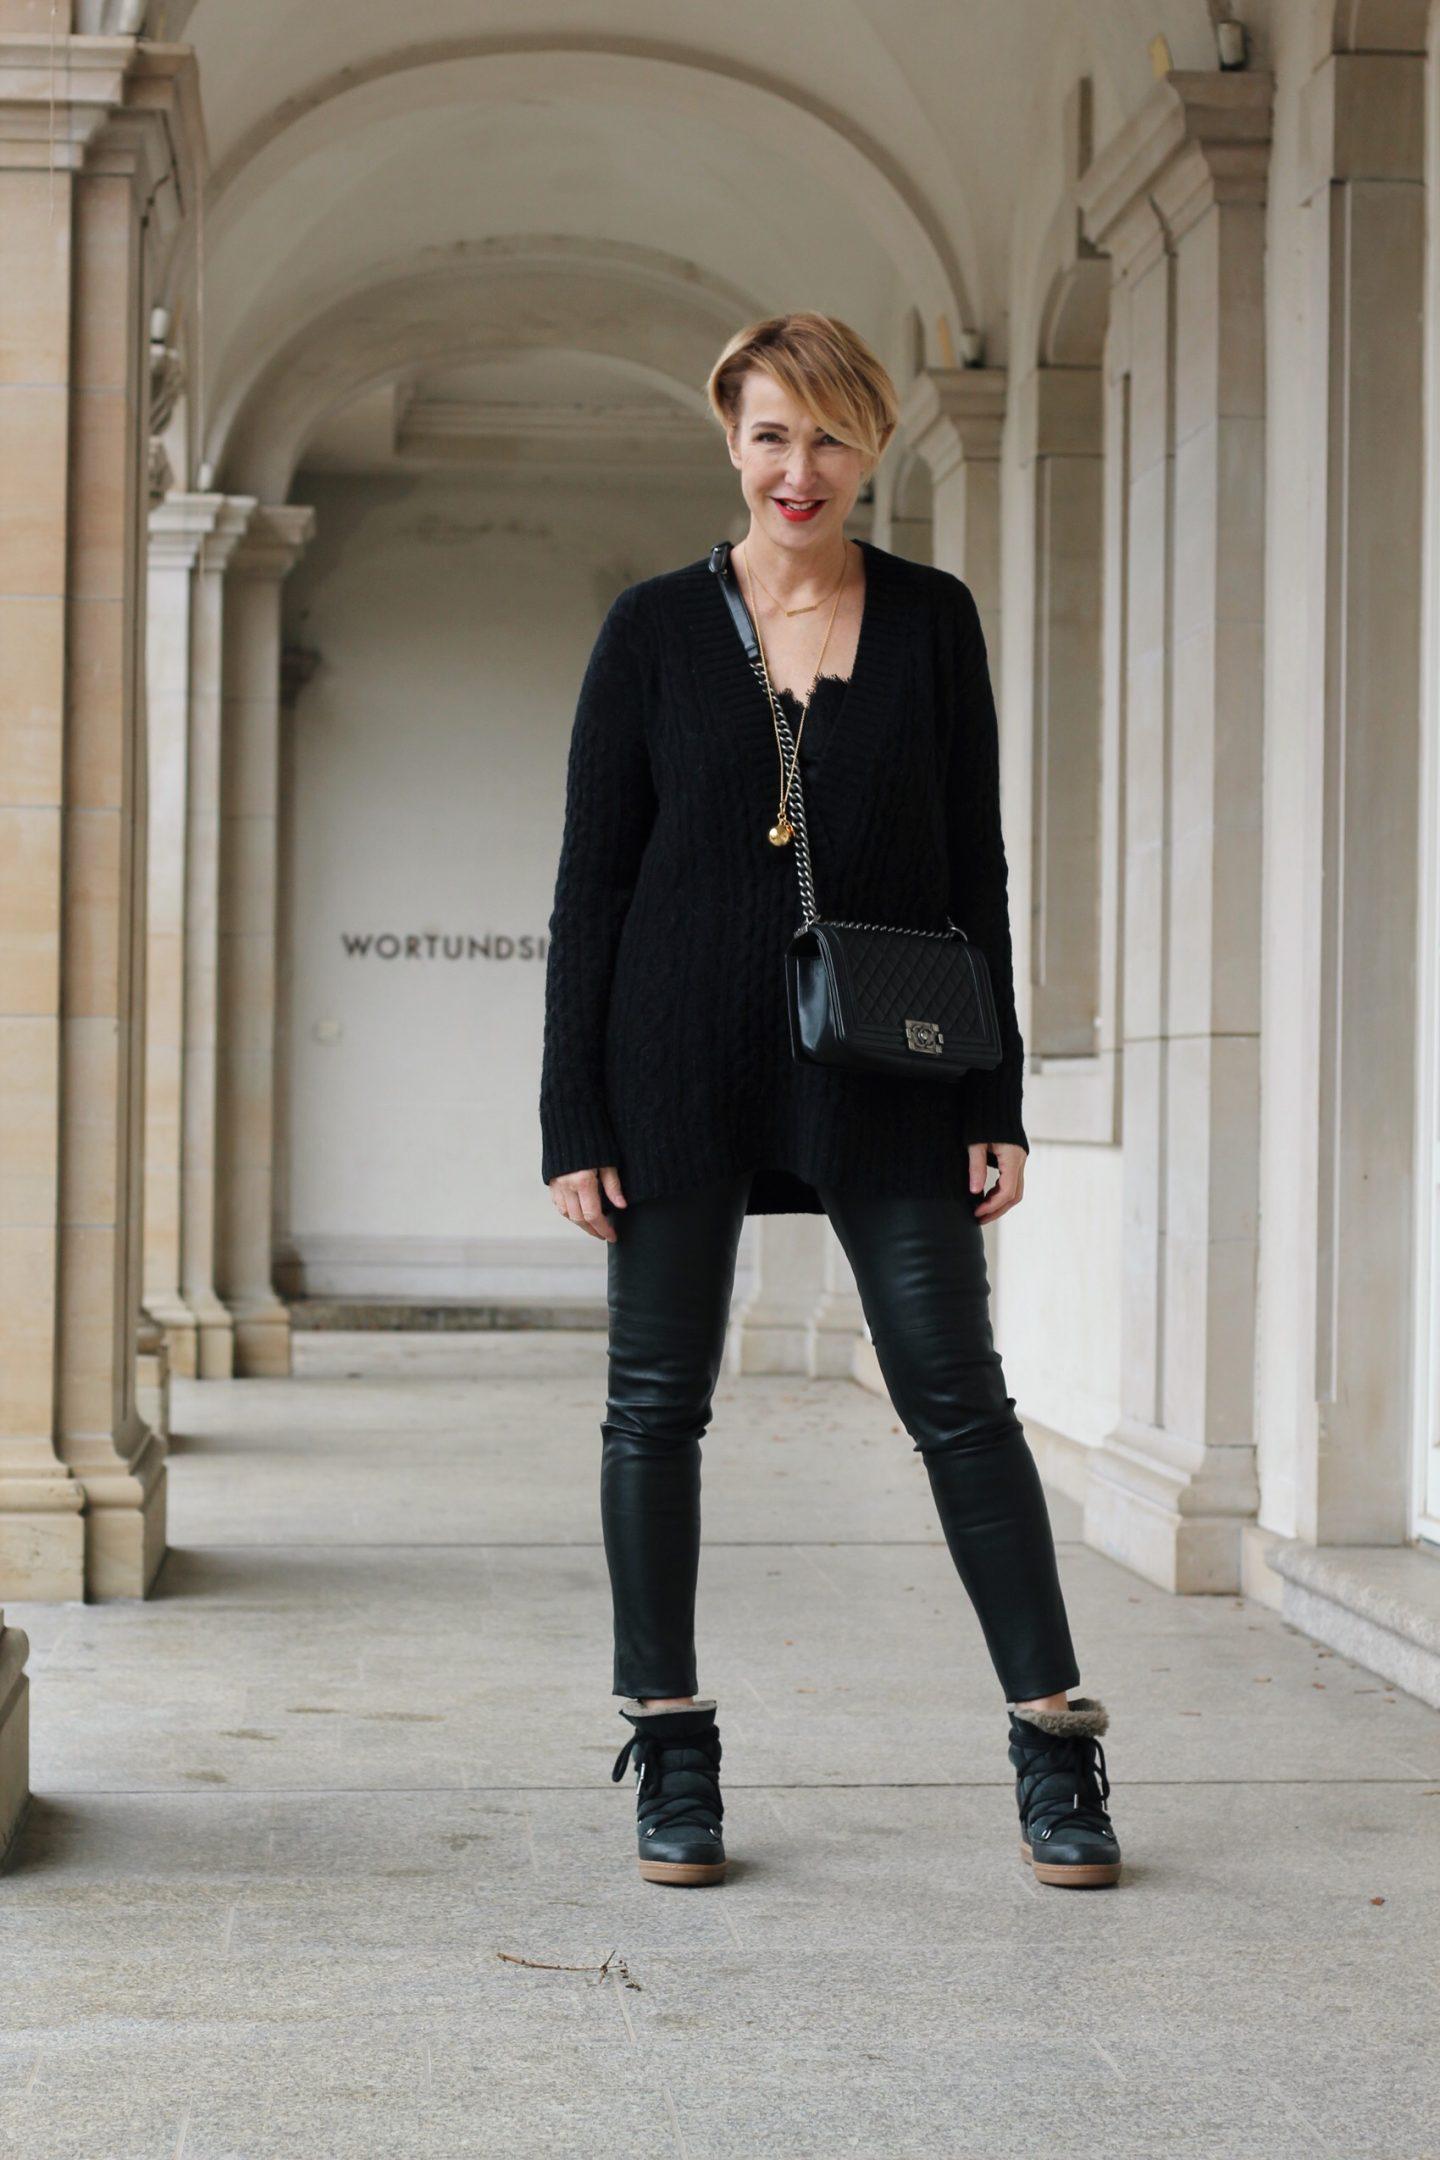 glamupyourlifestyle single kennenlernen Single-Männer Isabel-Marant-Boots chanel-boy ü-40-blog ü-50-blog ue-40-blog ue-50-blog